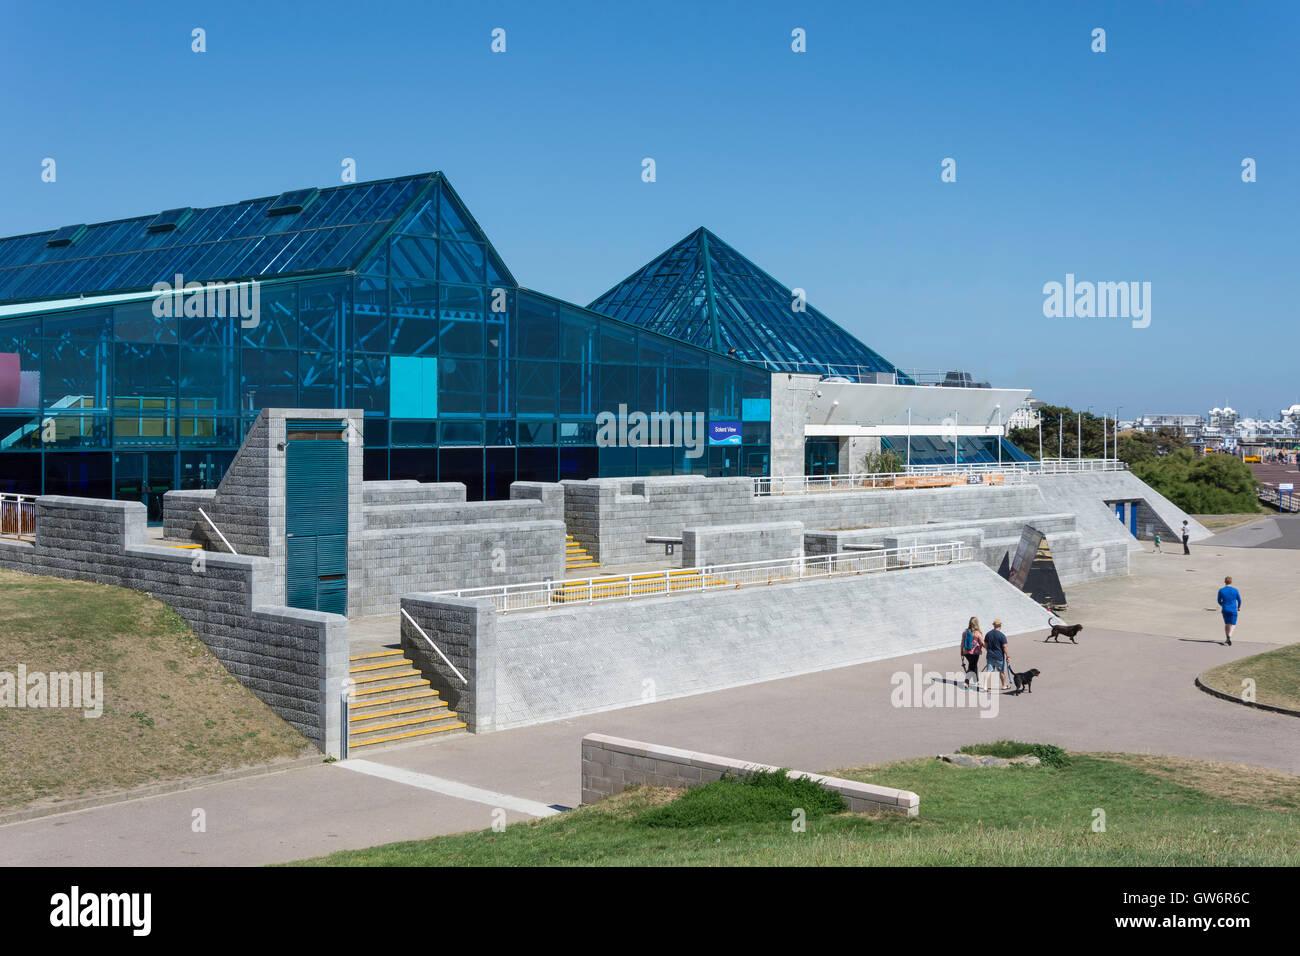 The Pyramids Entertainment Centre,Clarence Esplanade, Southsea, Portsmouth, Hampshire, England, United Kingdom Stock Photo